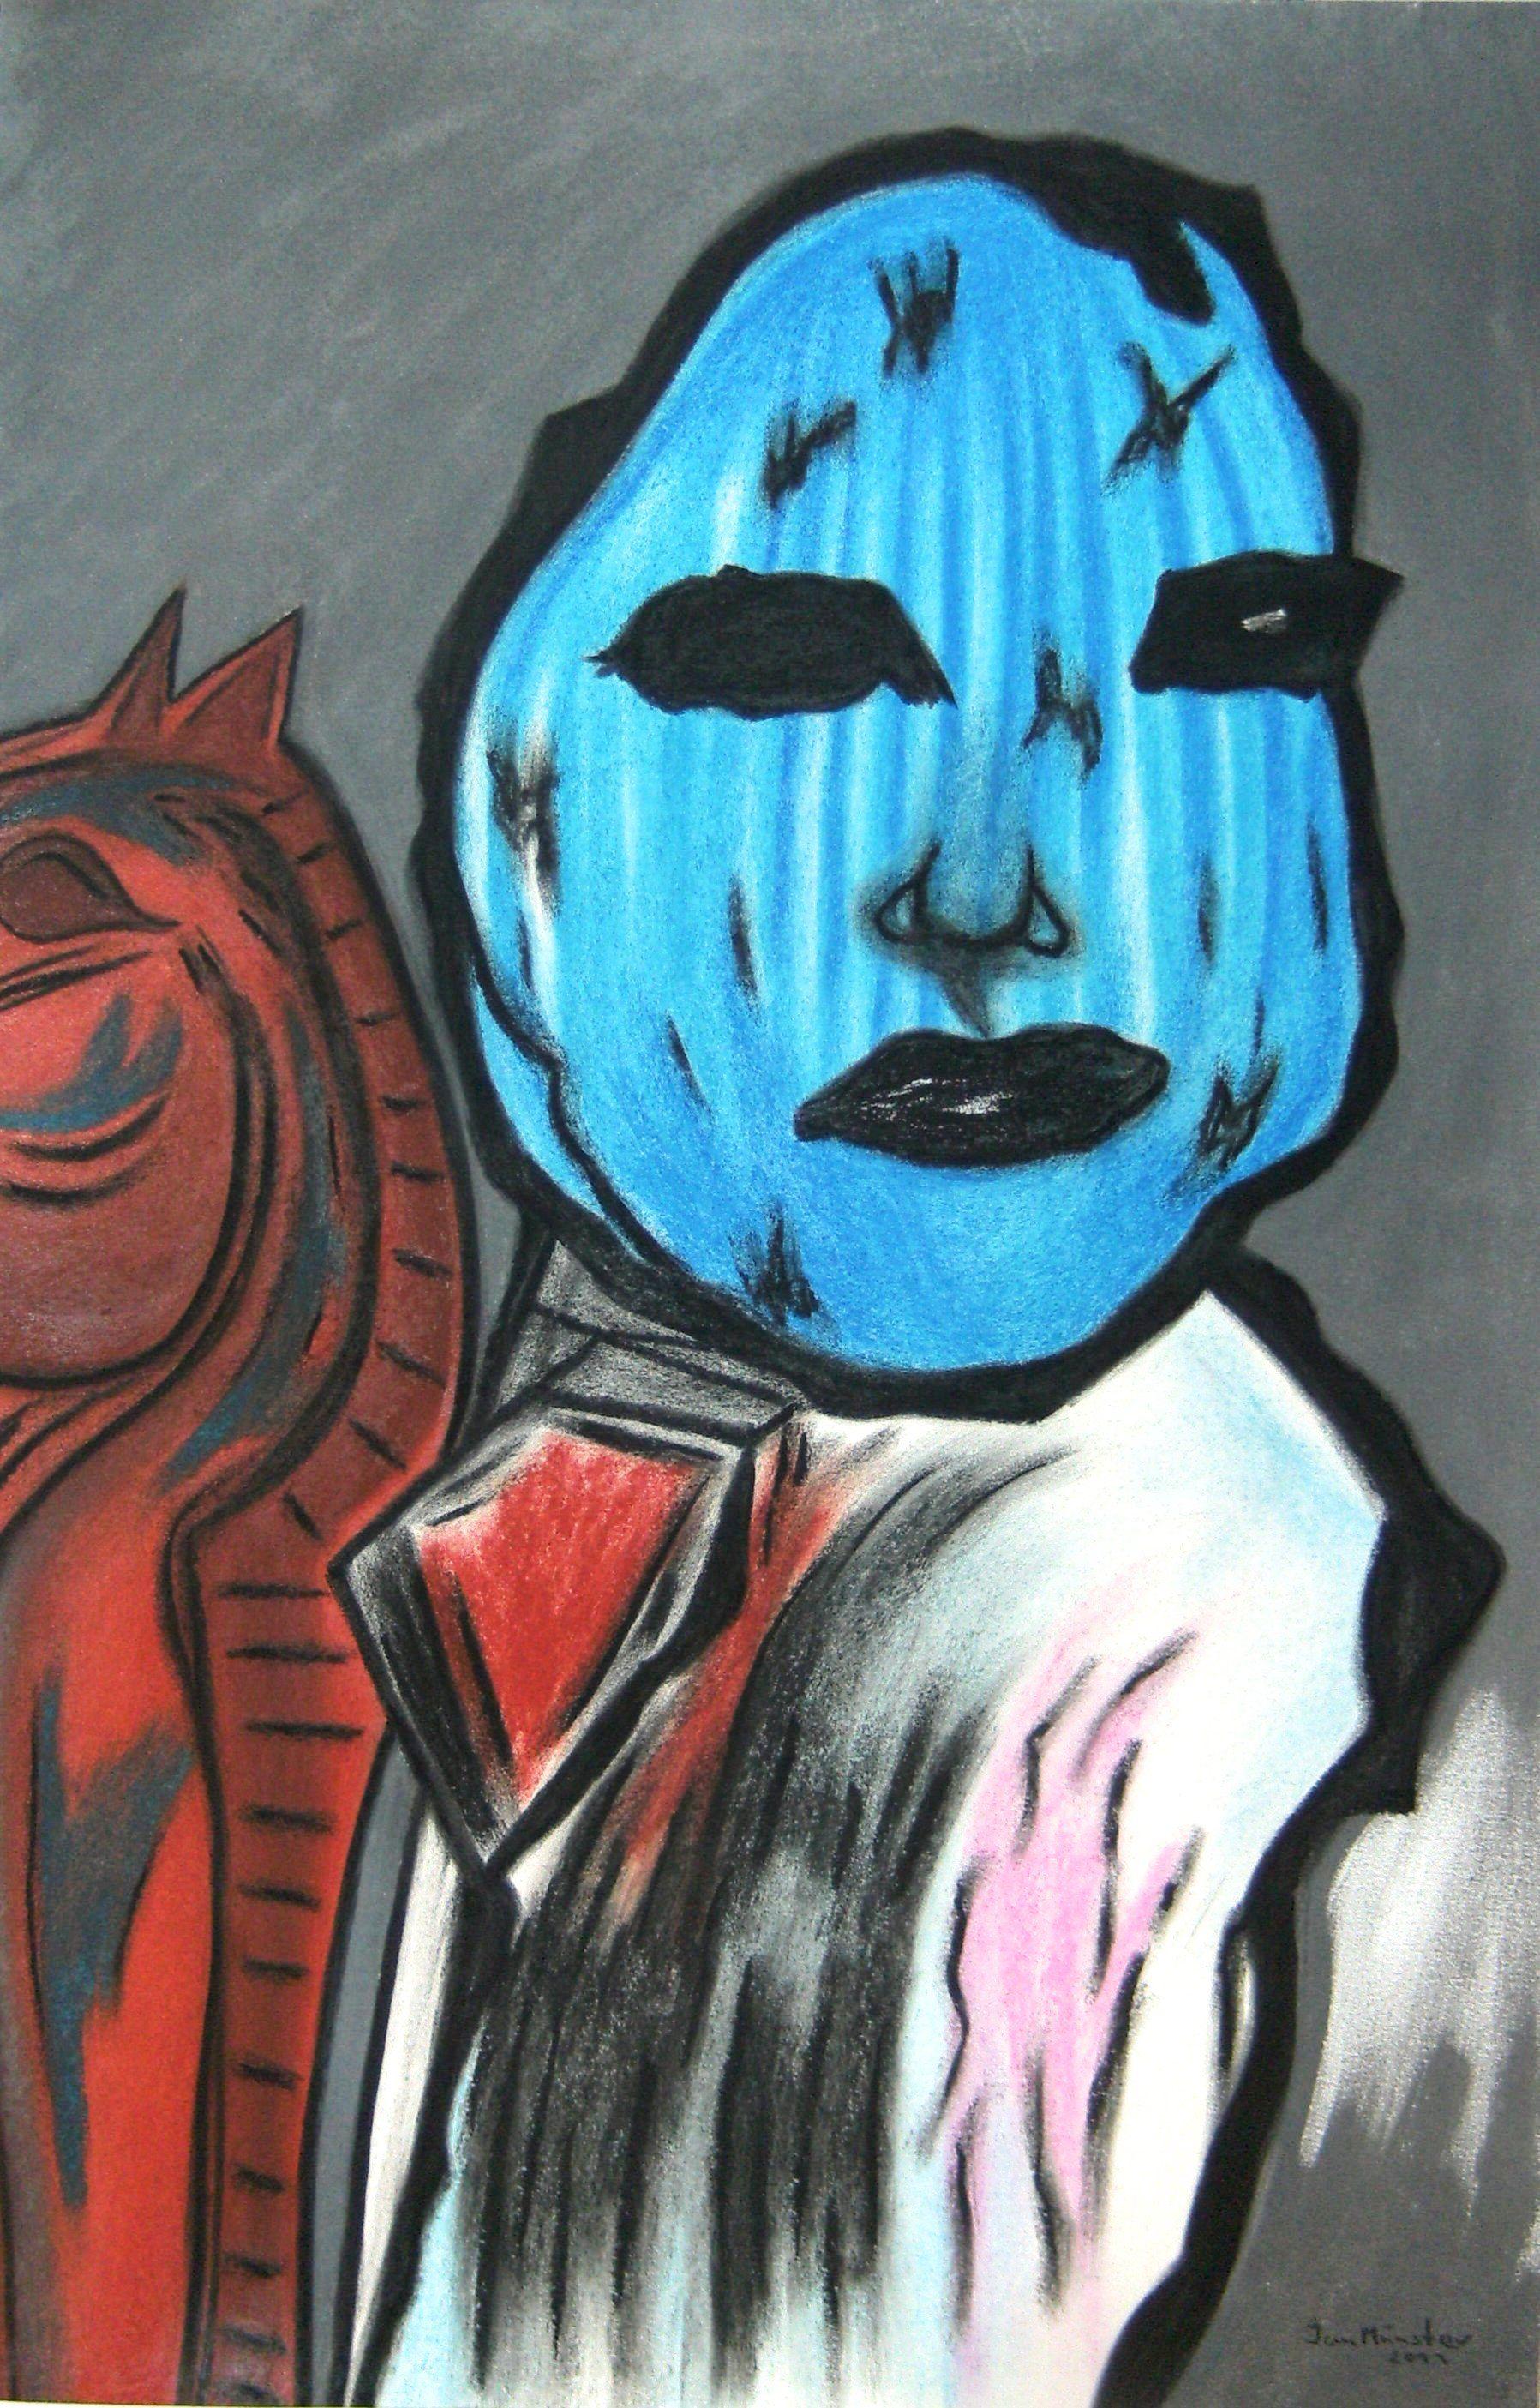 http://www.atelier7-tdf.de/ kunst von jan